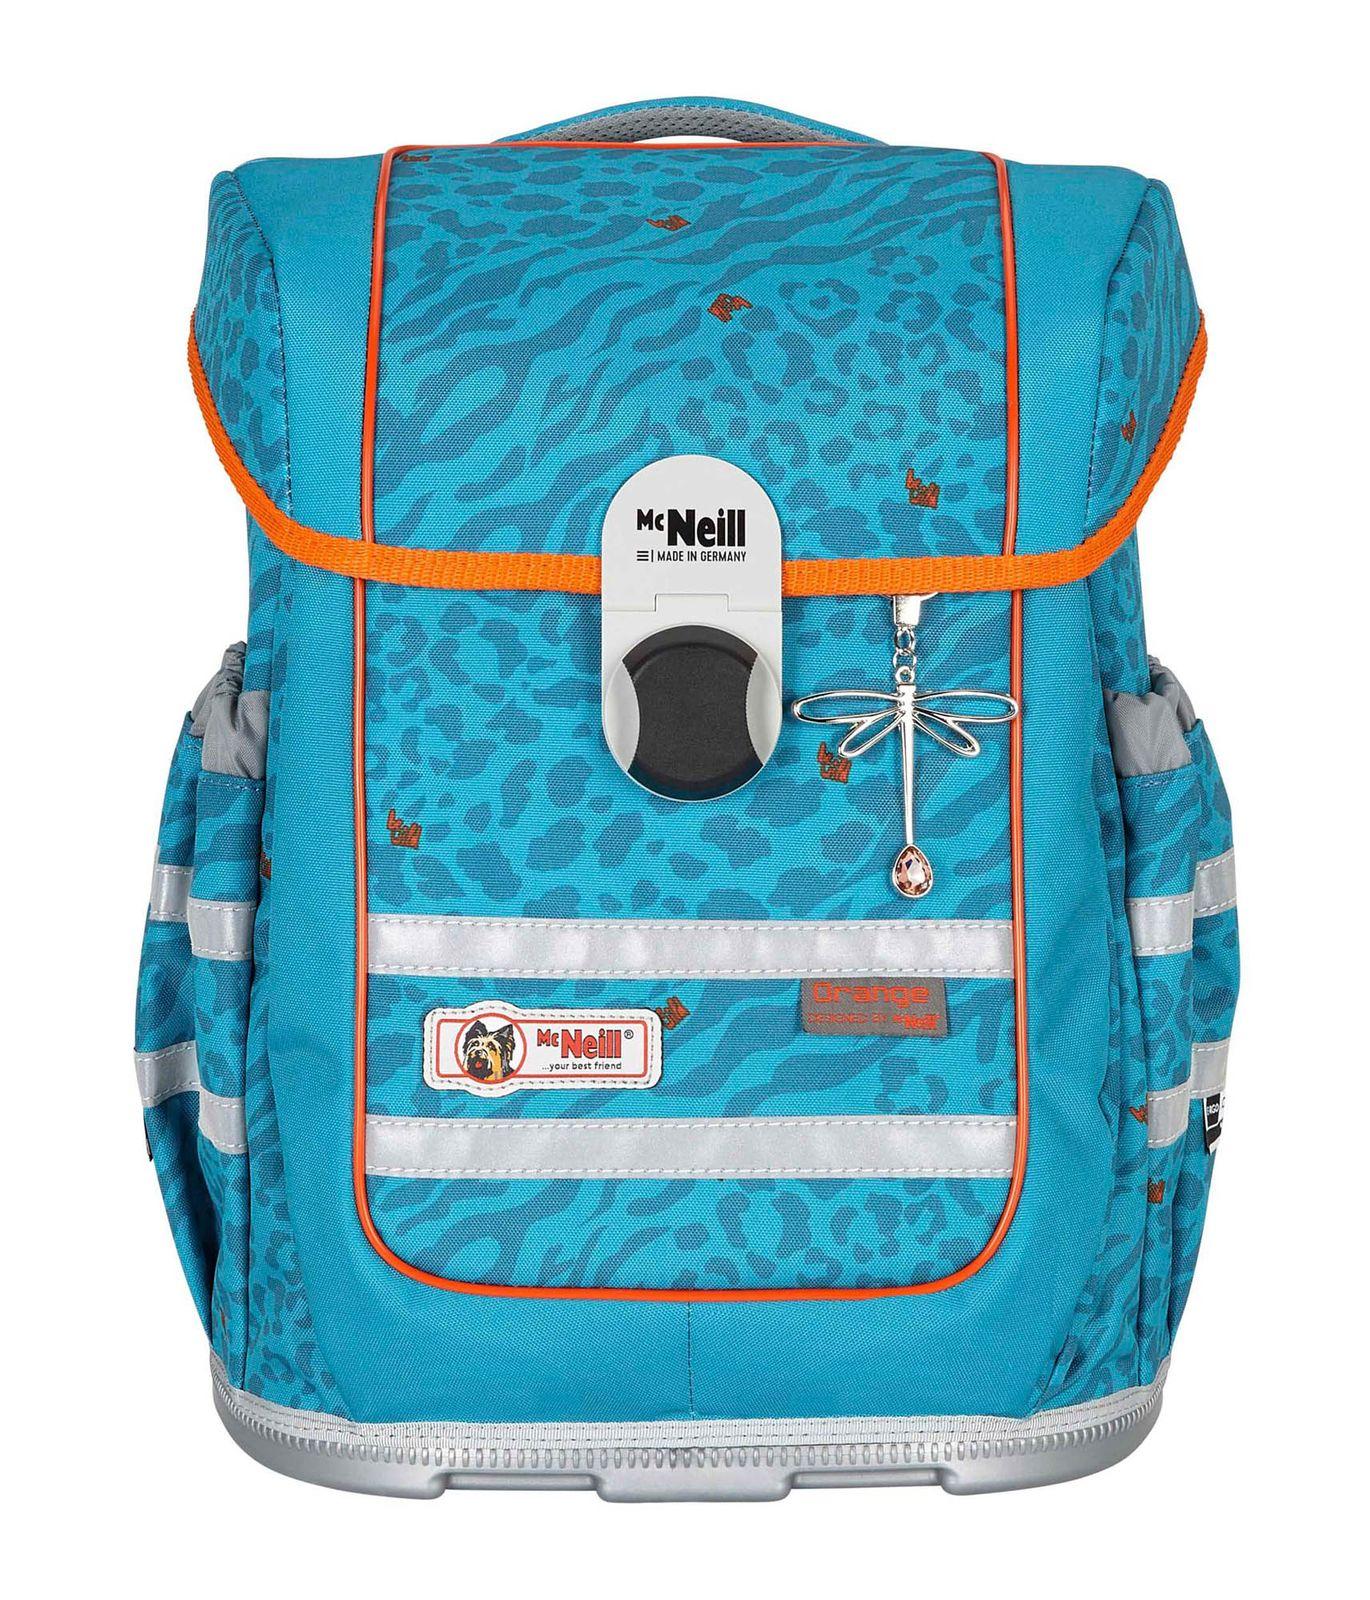 McNeill Ergo Complete Schoolbag Orange